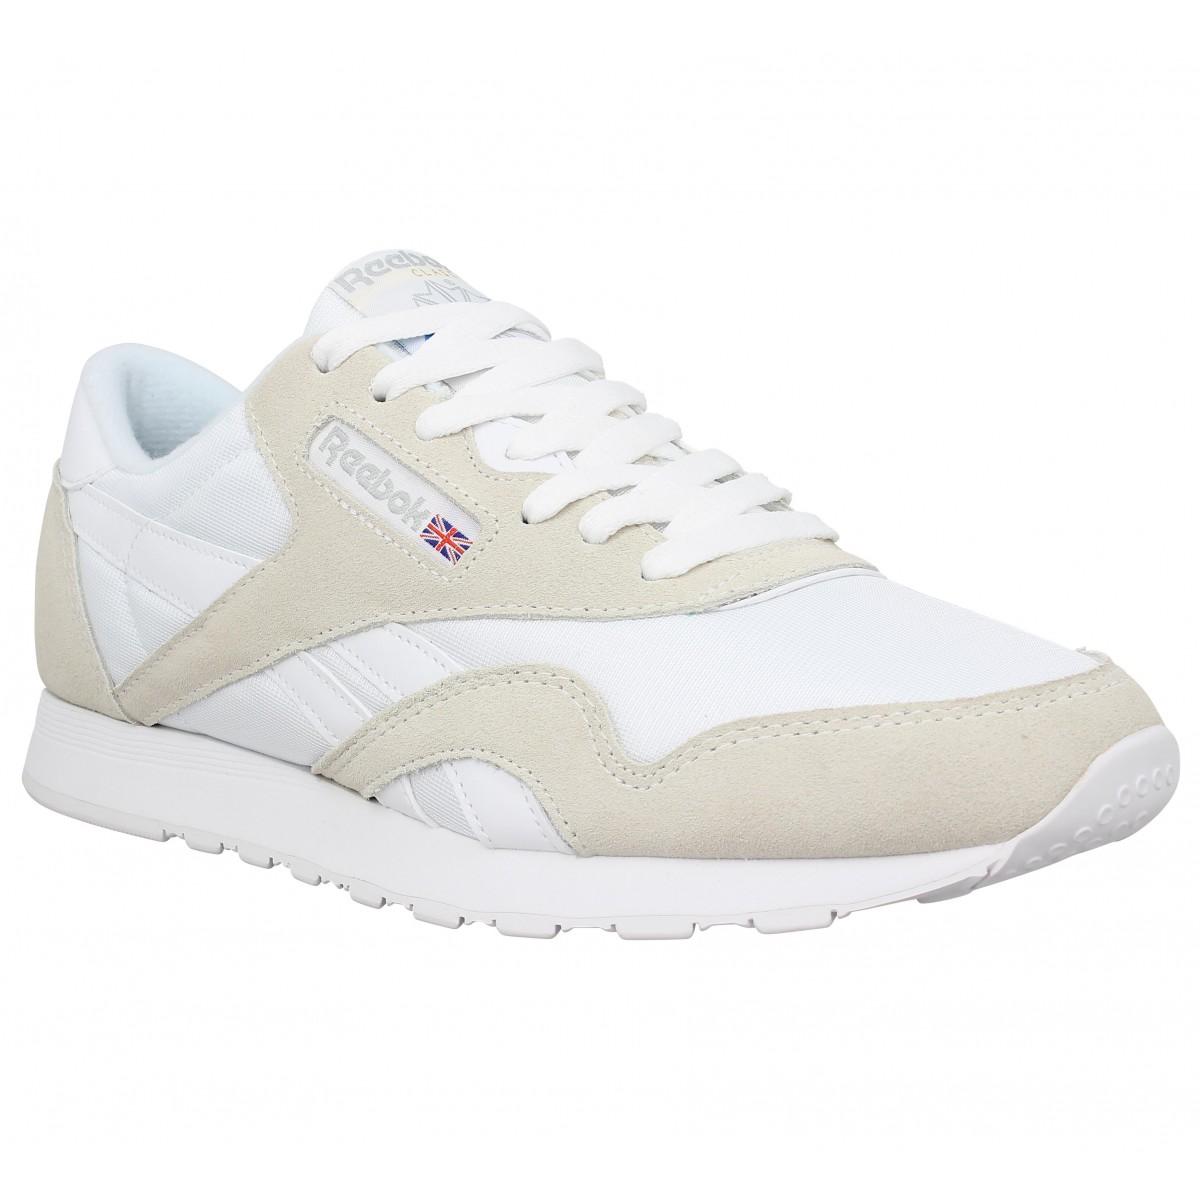 sale retailer affad 12828 Chaussures Toile Classic Blanc Homme Reebok Nylon Fanny nqYwvnHO